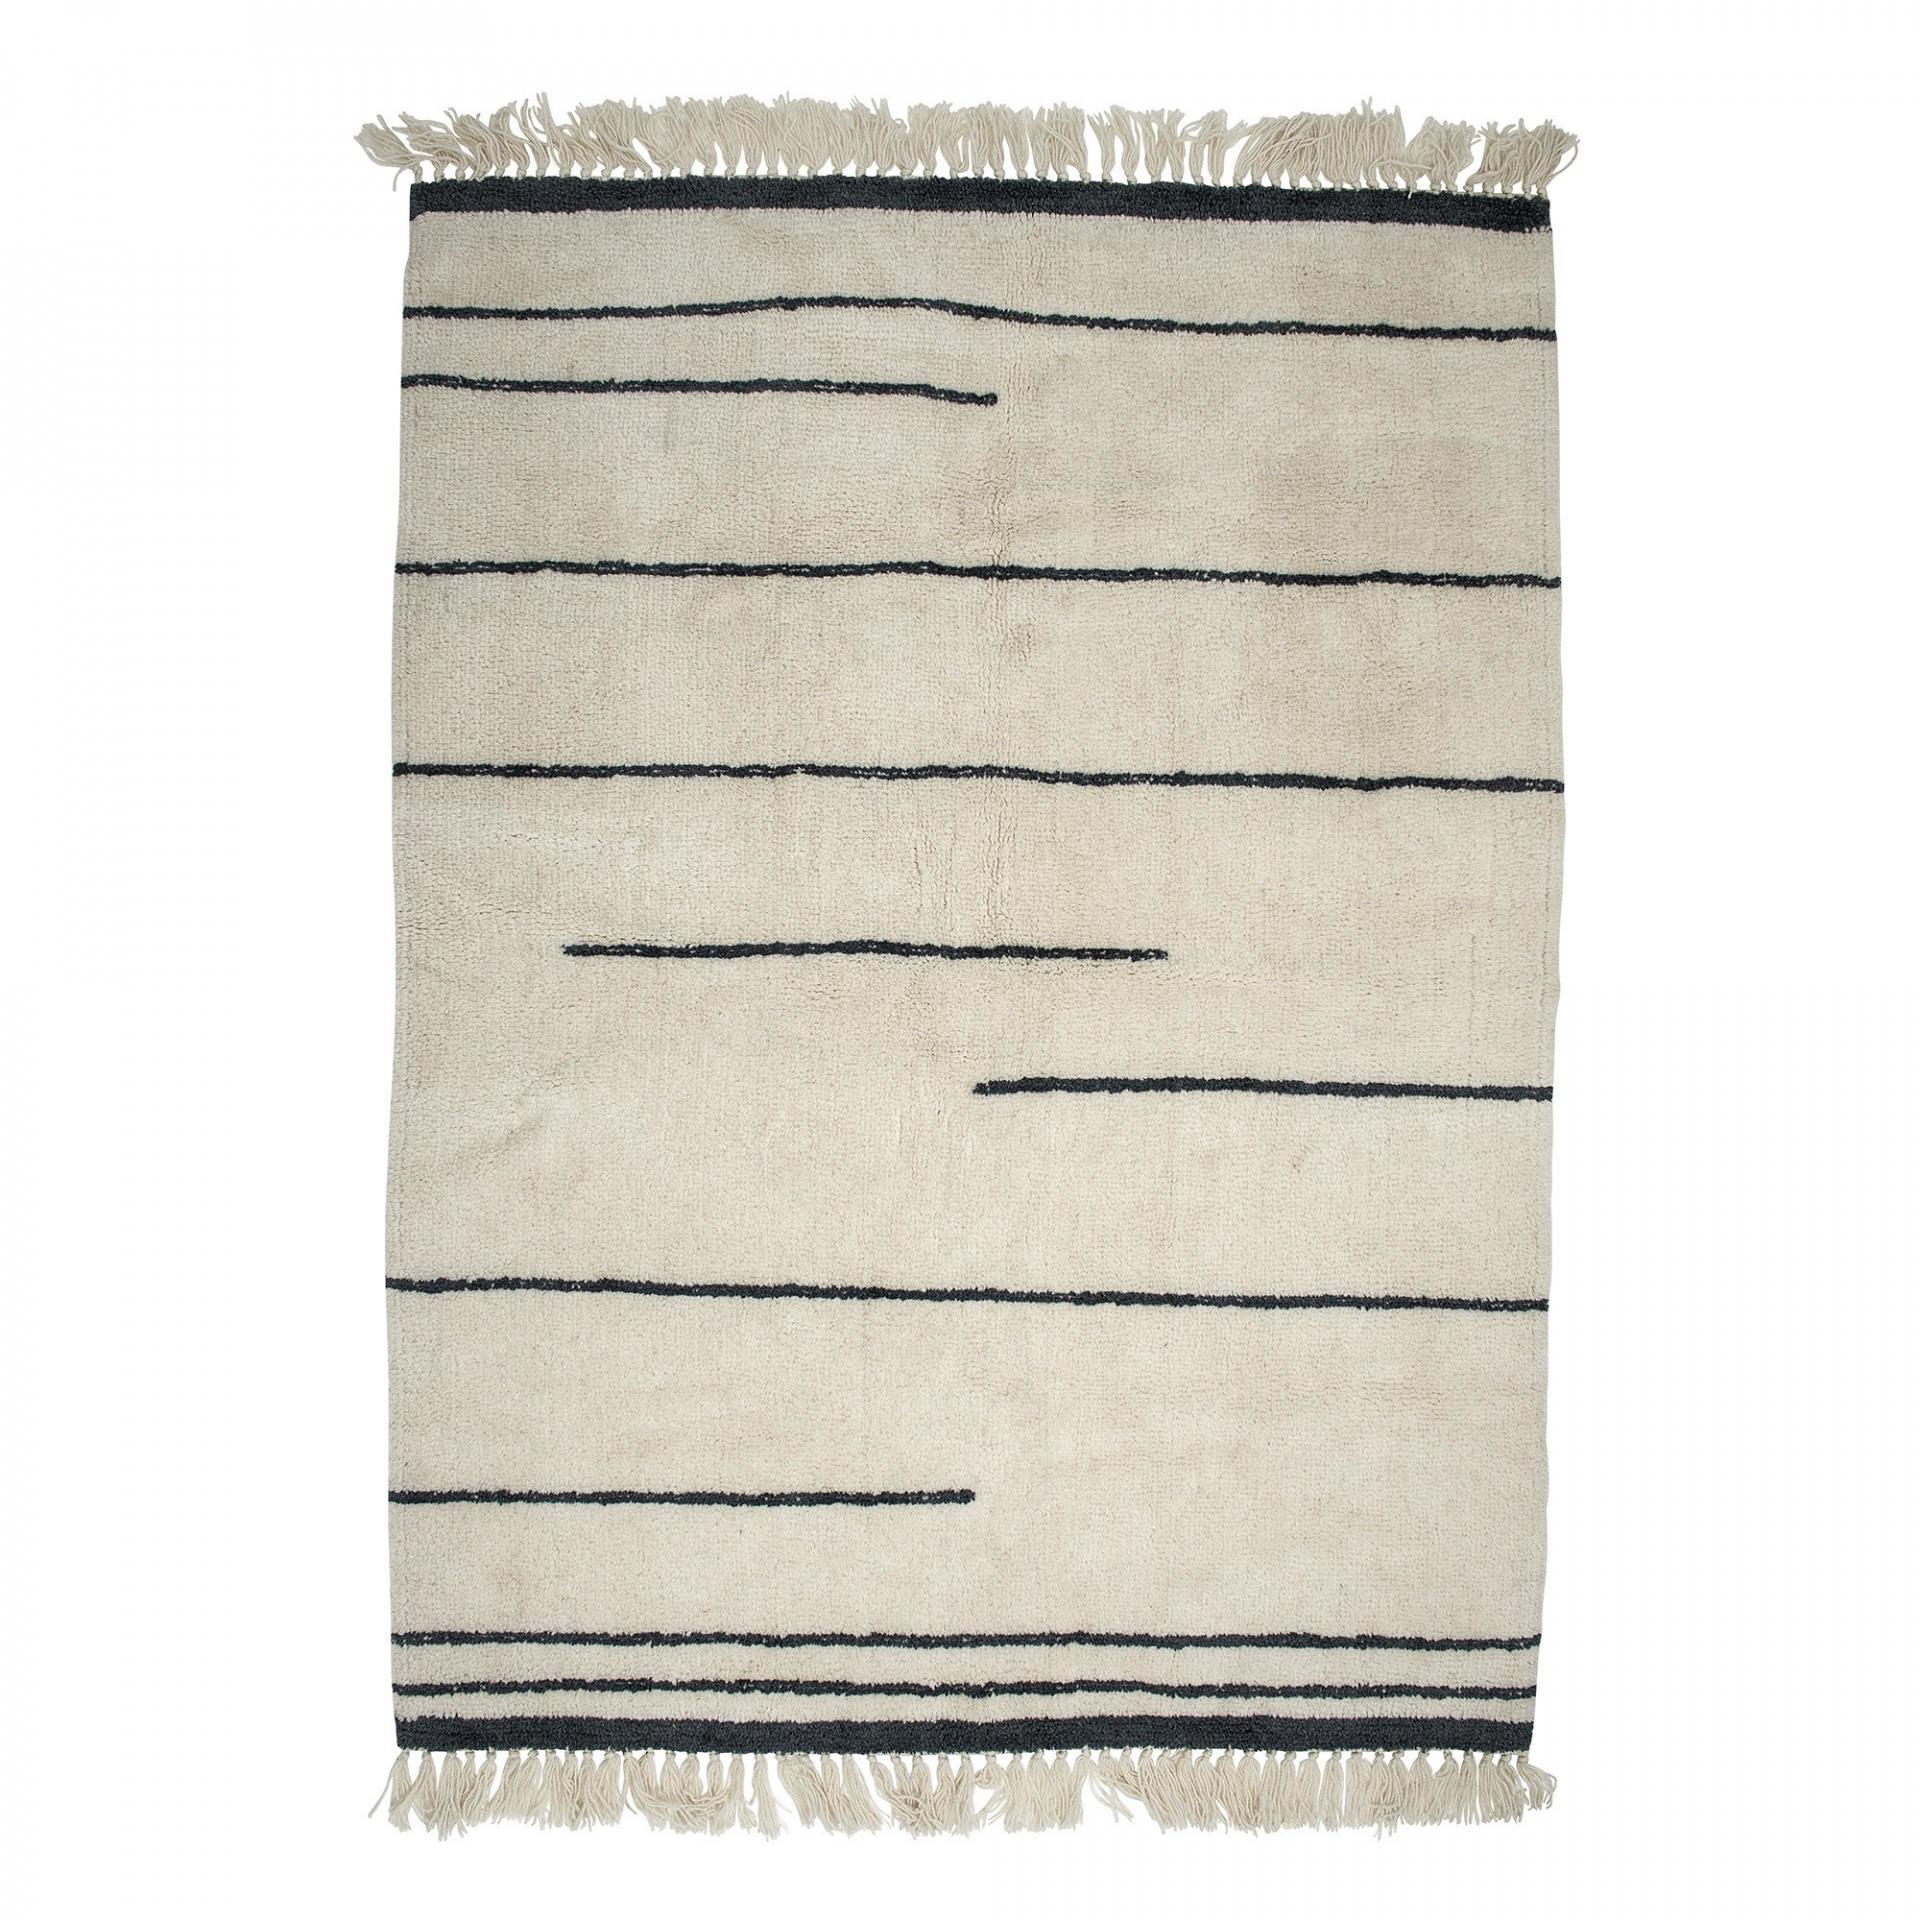 Bloomingville Vlněný koberec Line 140x200 cm, šedá barva, krémová barva, textil